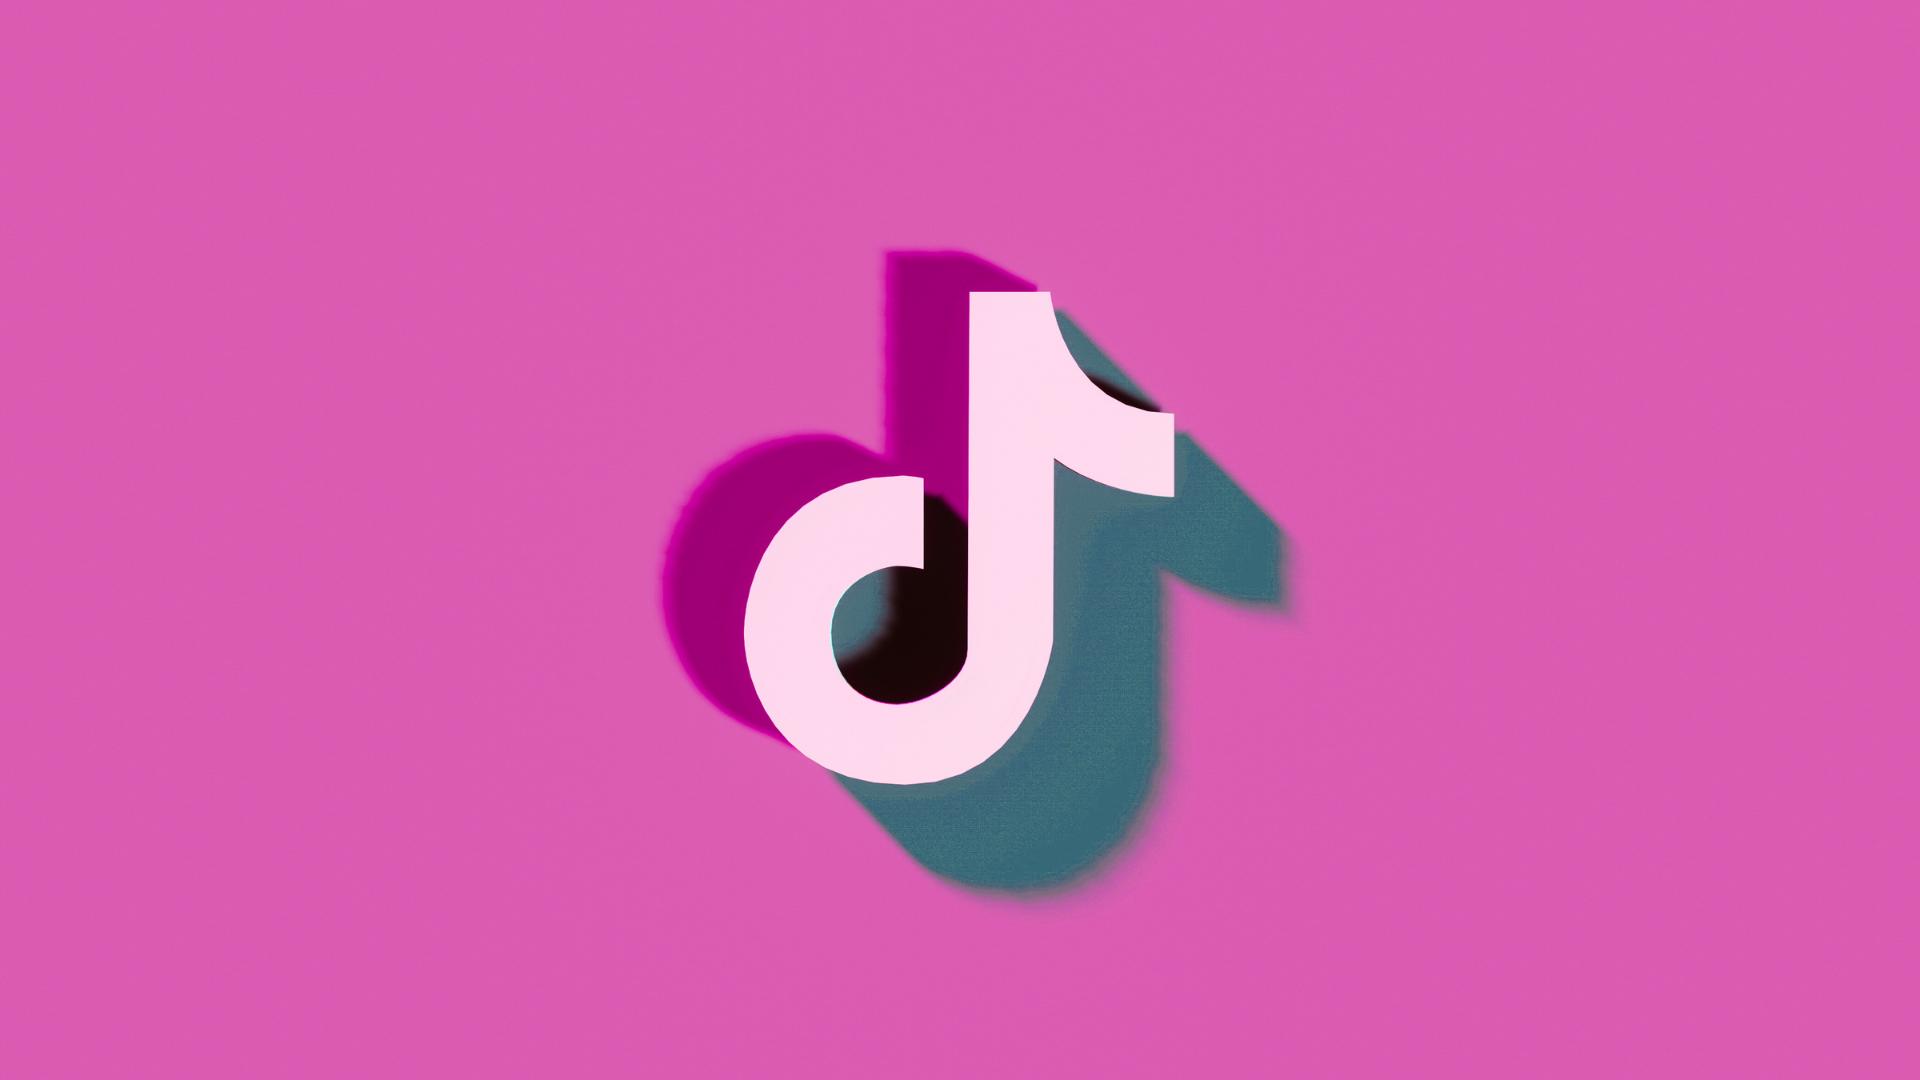 tiktok logo on pink background